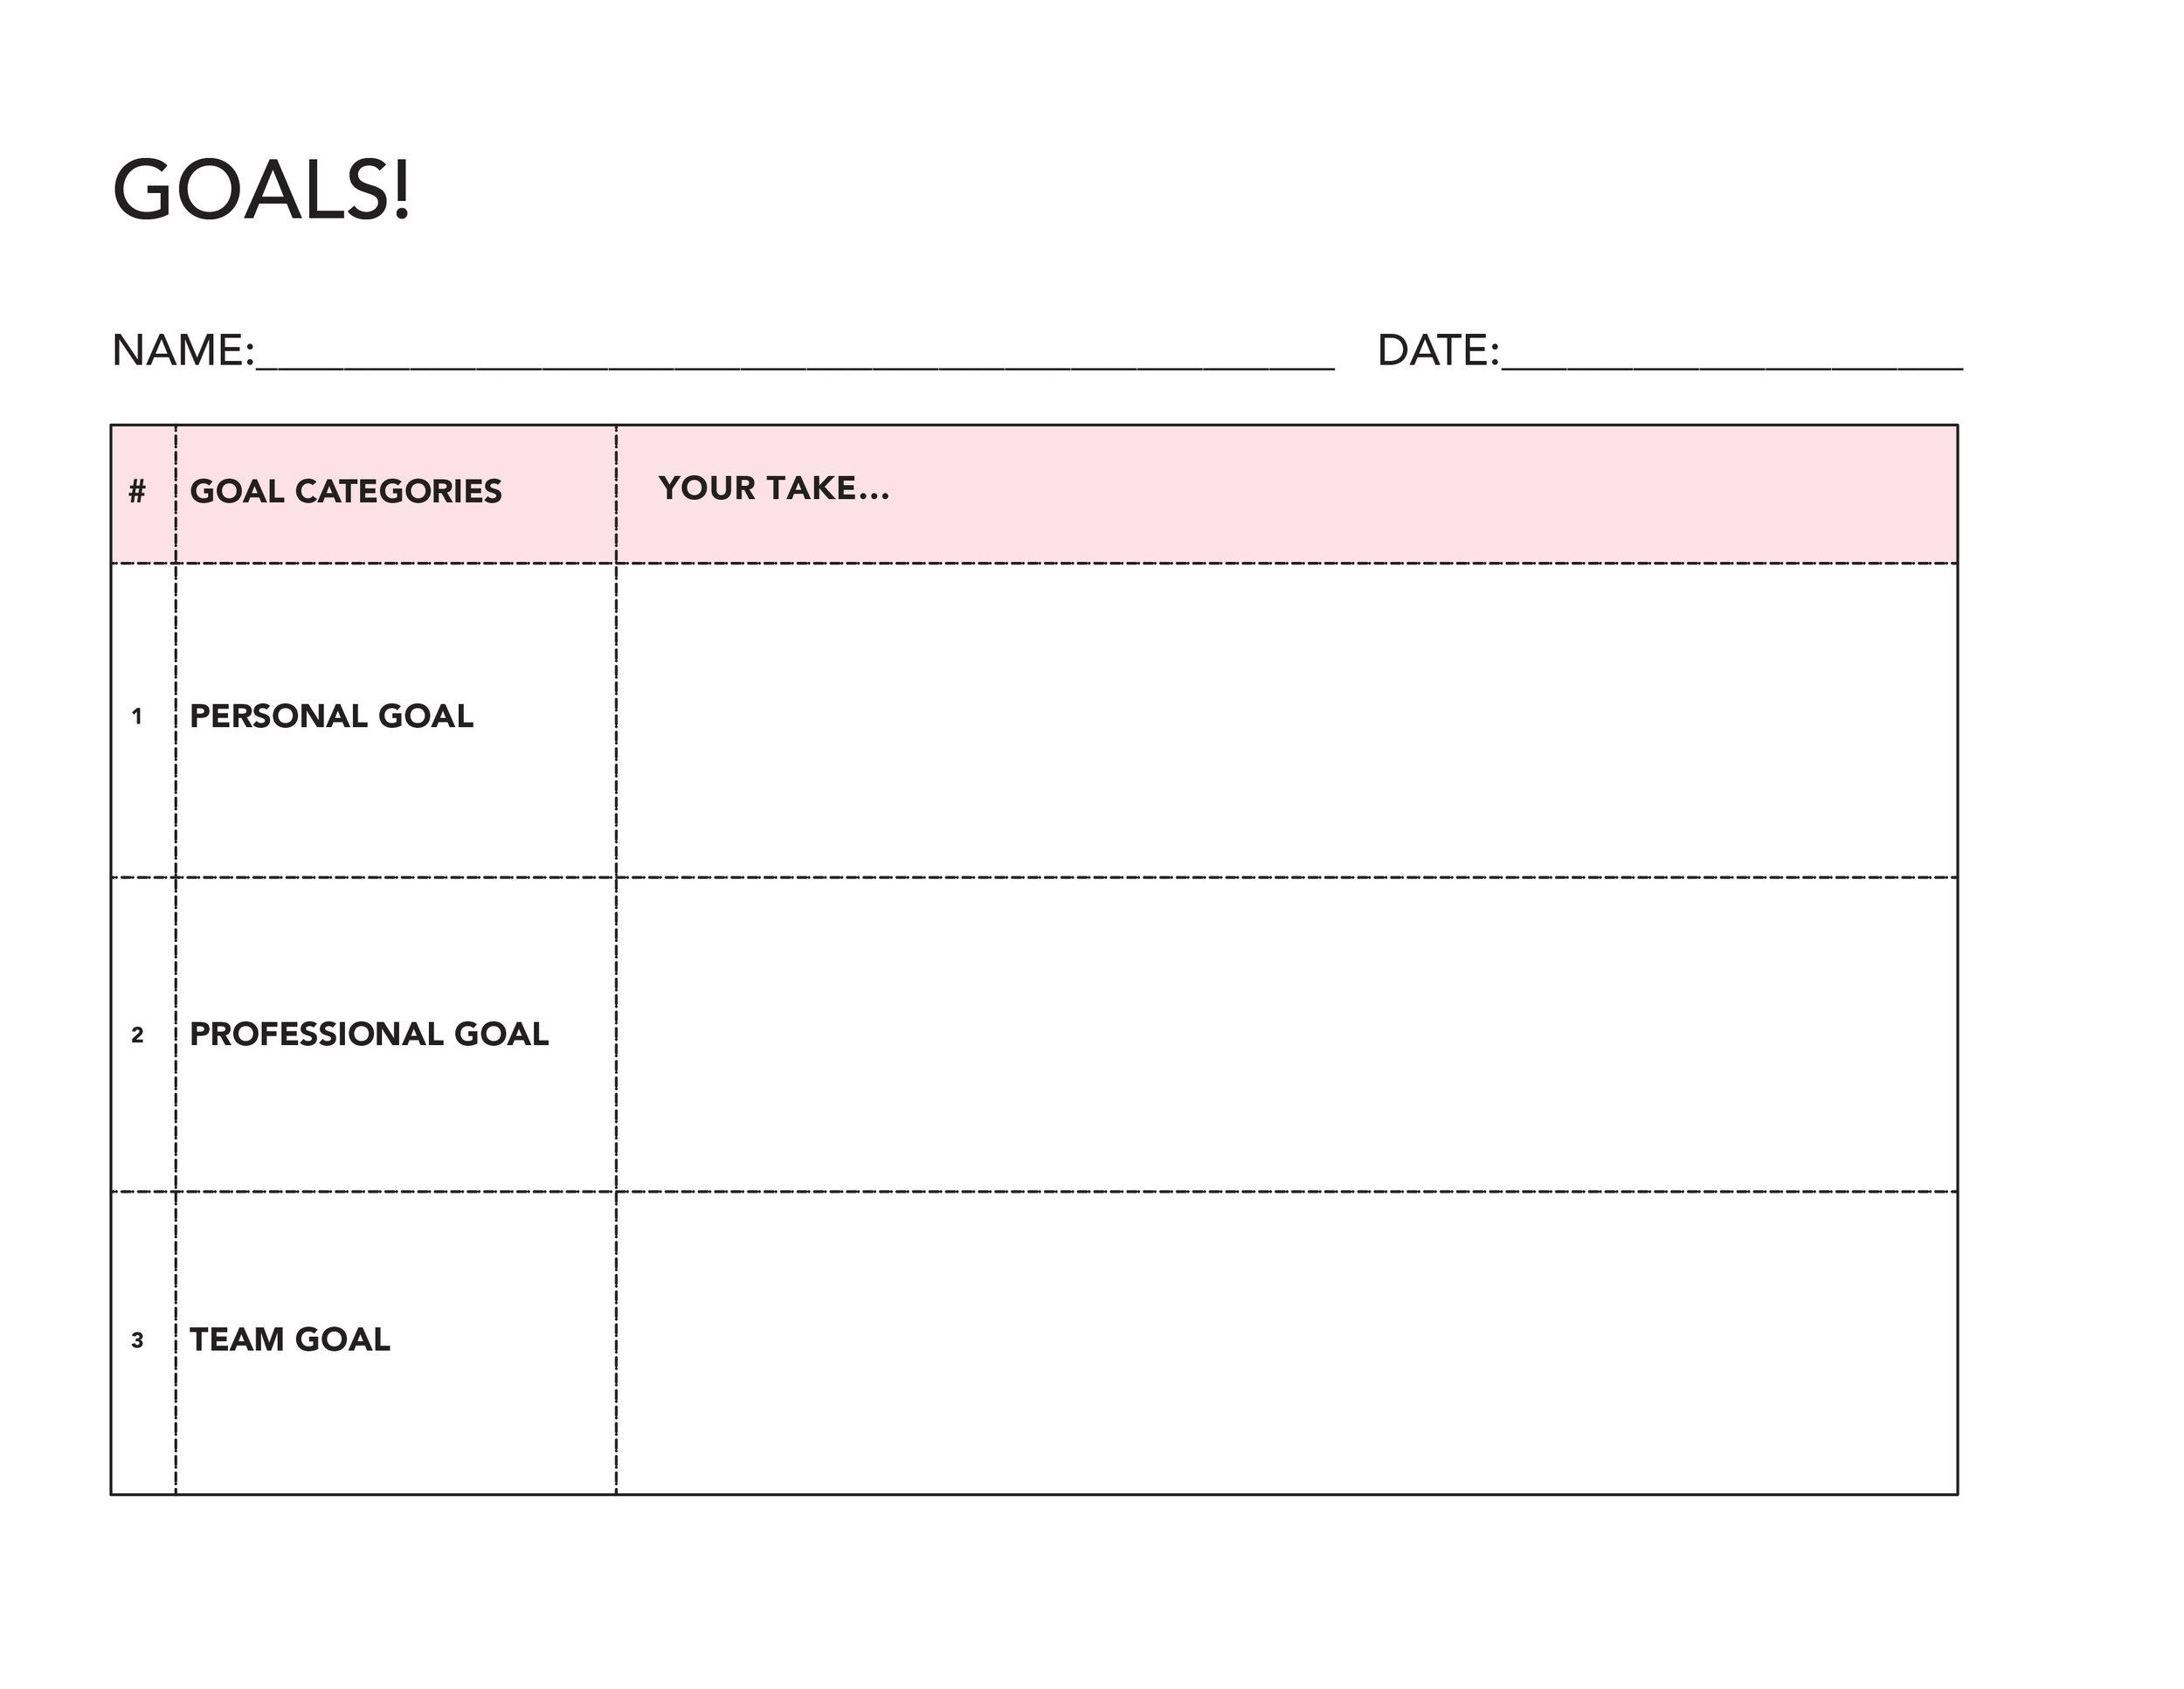 Goals worksheet-02.jpg